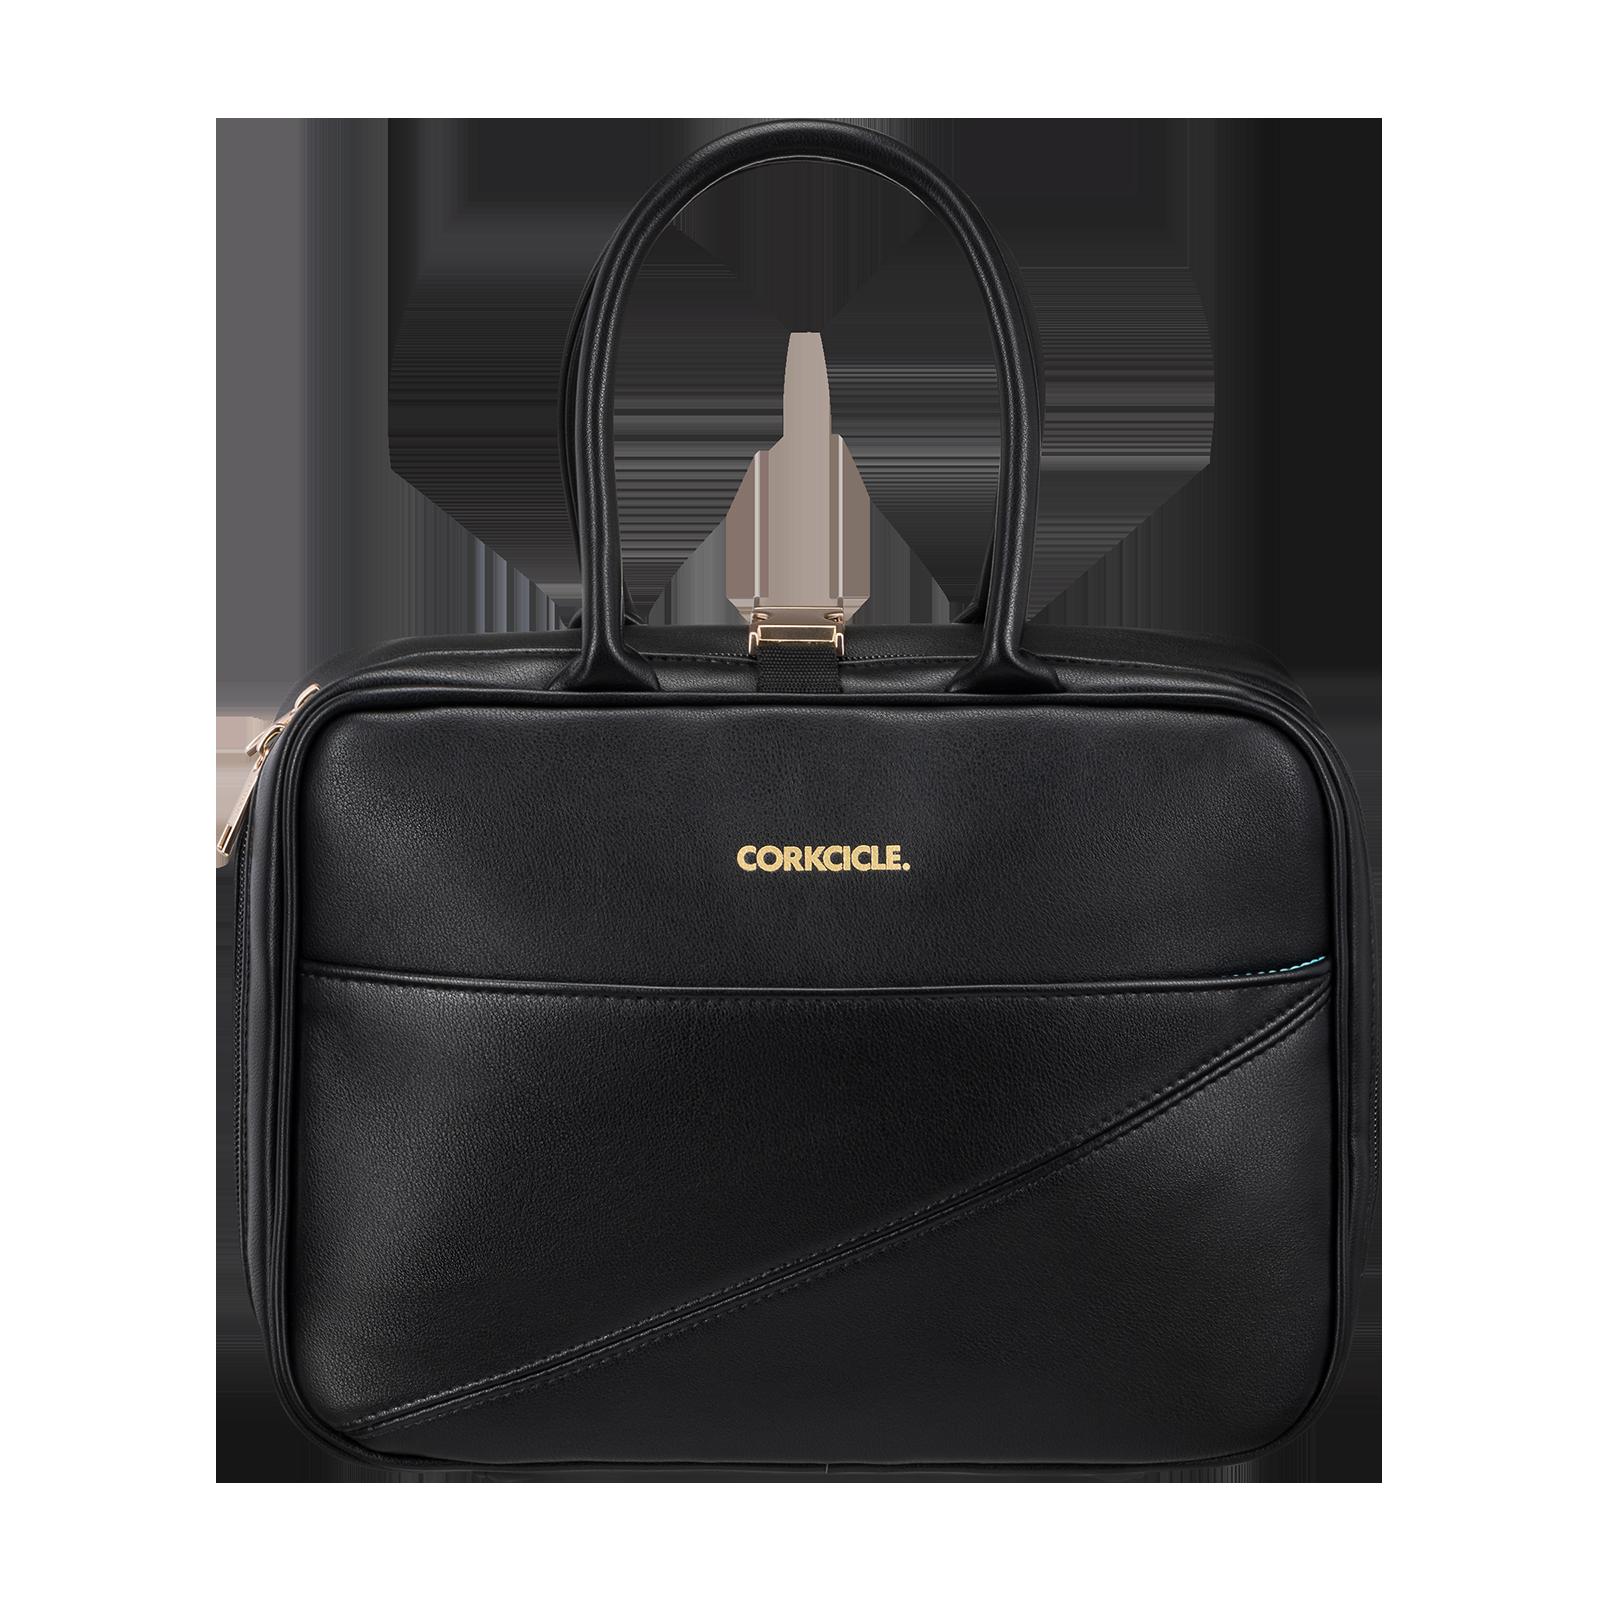 Black handbag product image